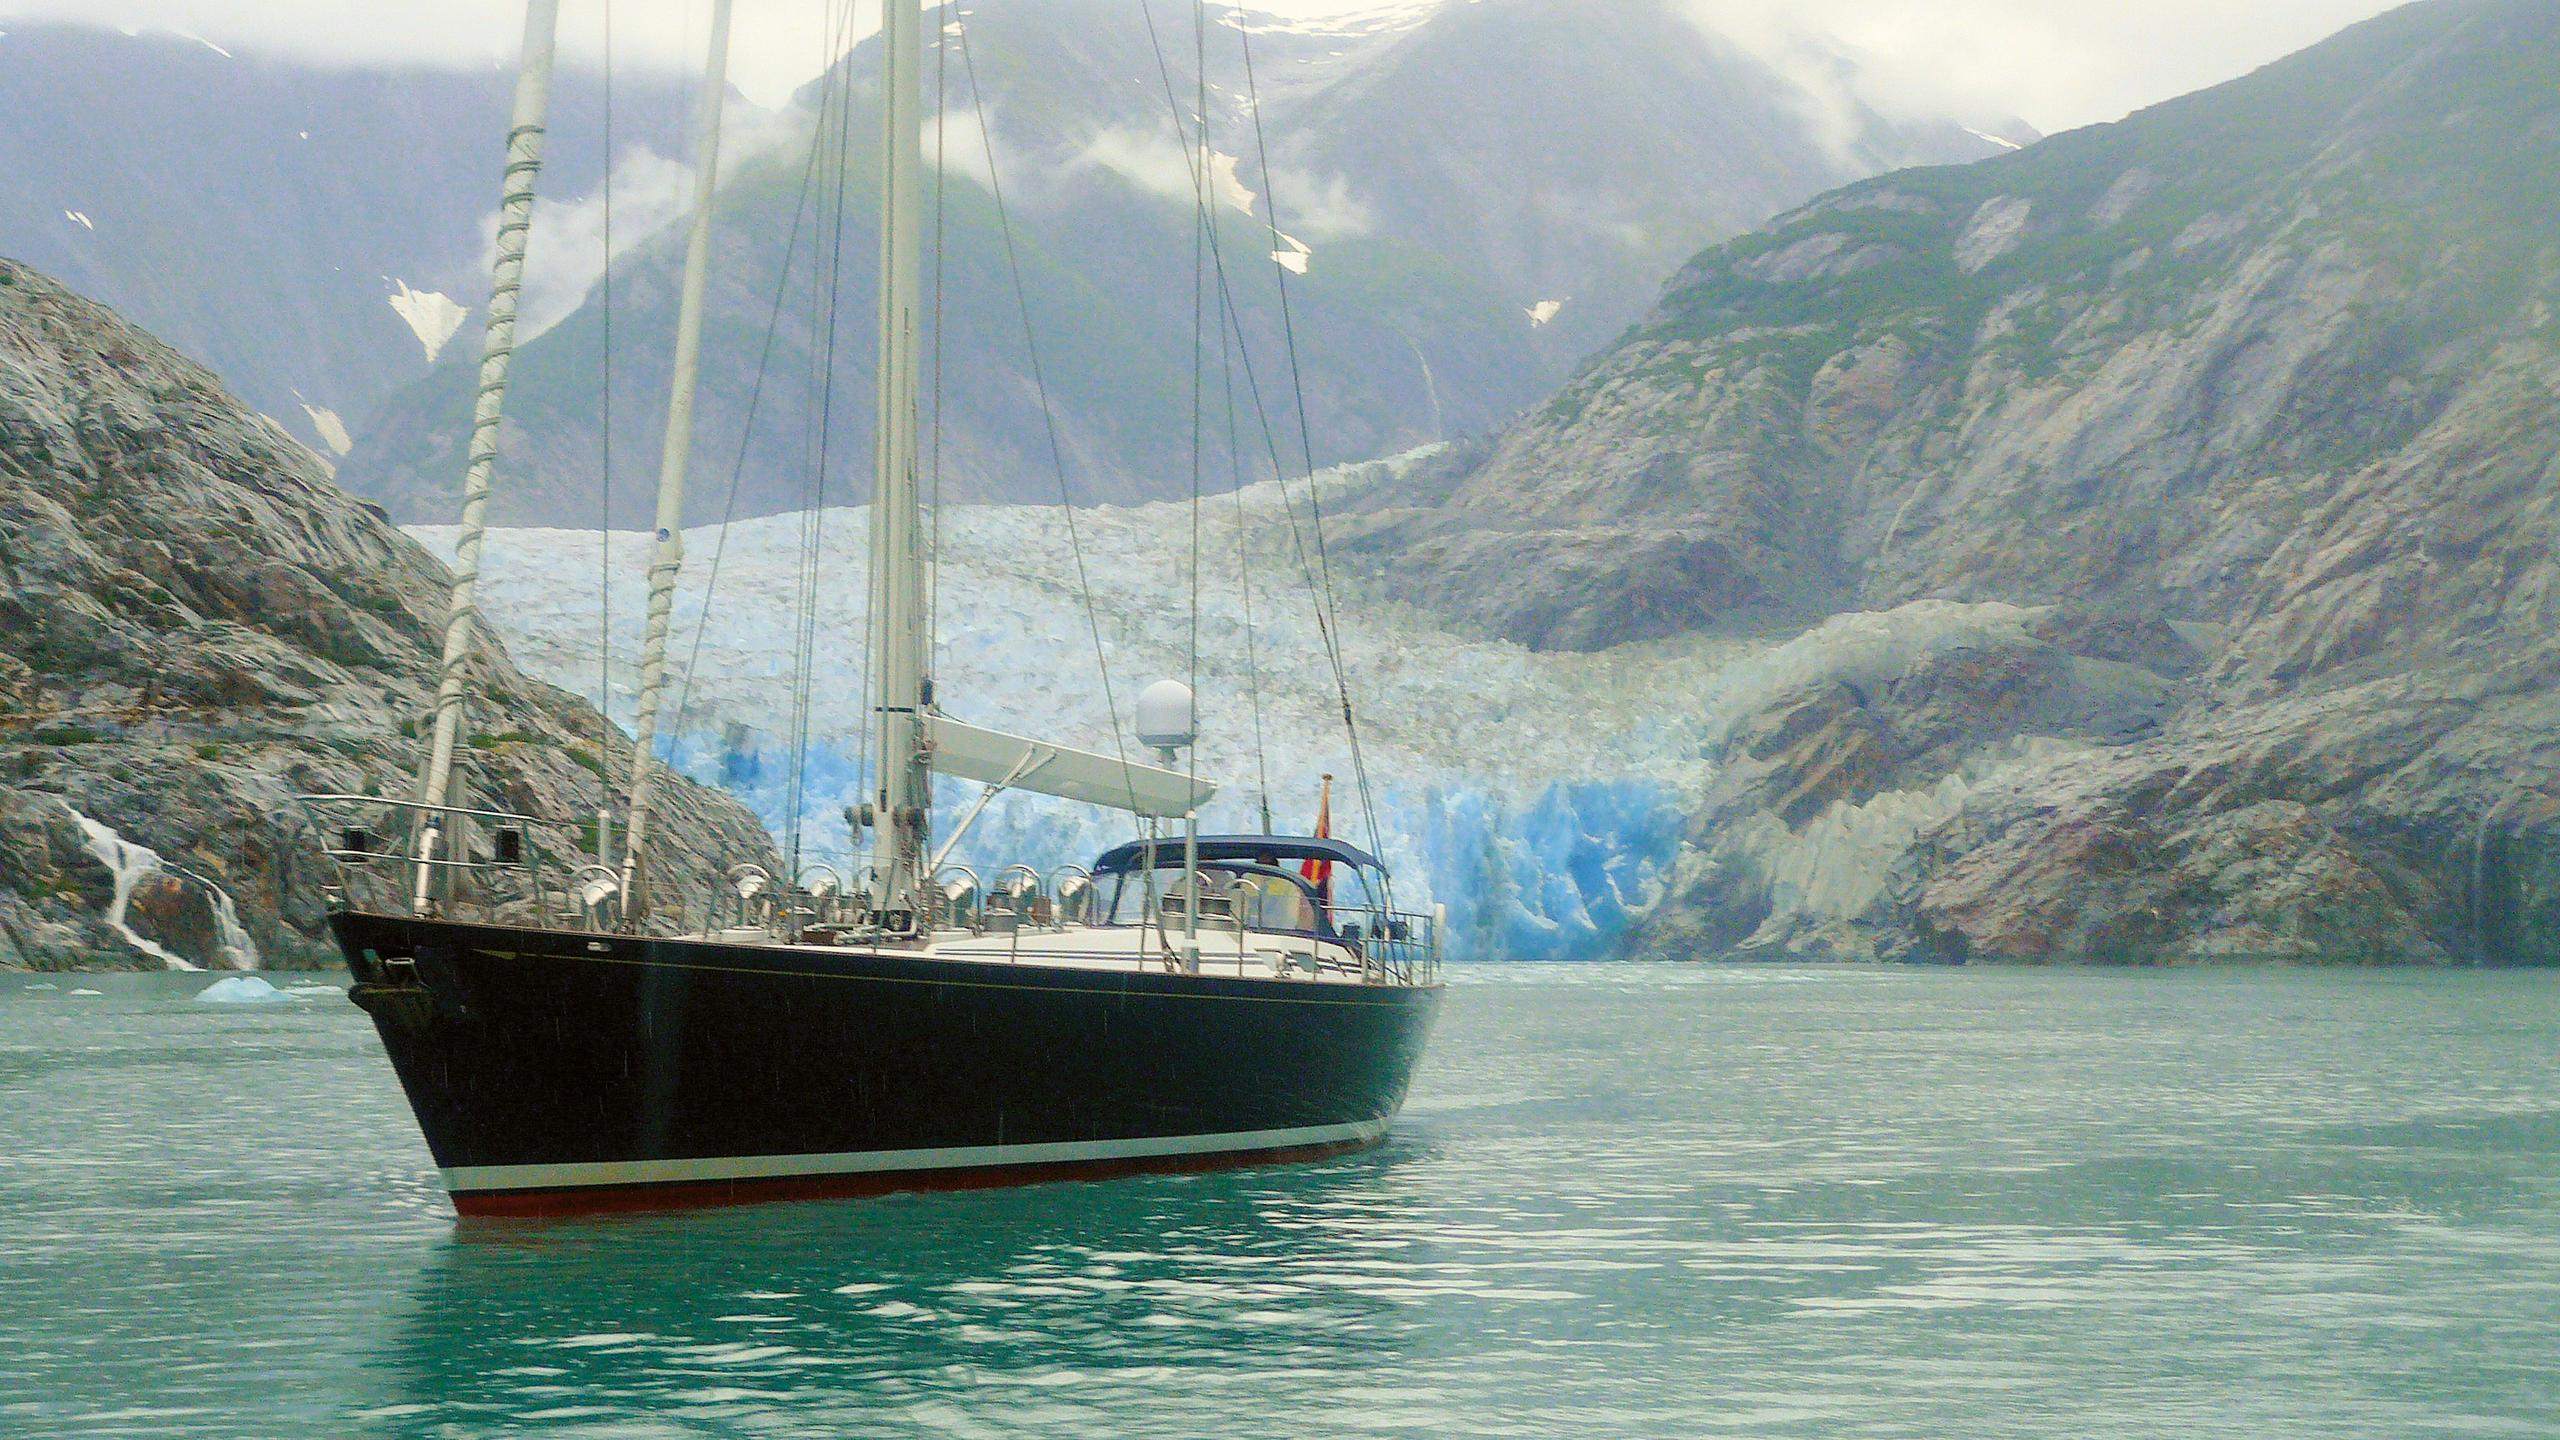 metolius-sailing-yacht-royal-huisman-1992-26m-sawyer-glacier